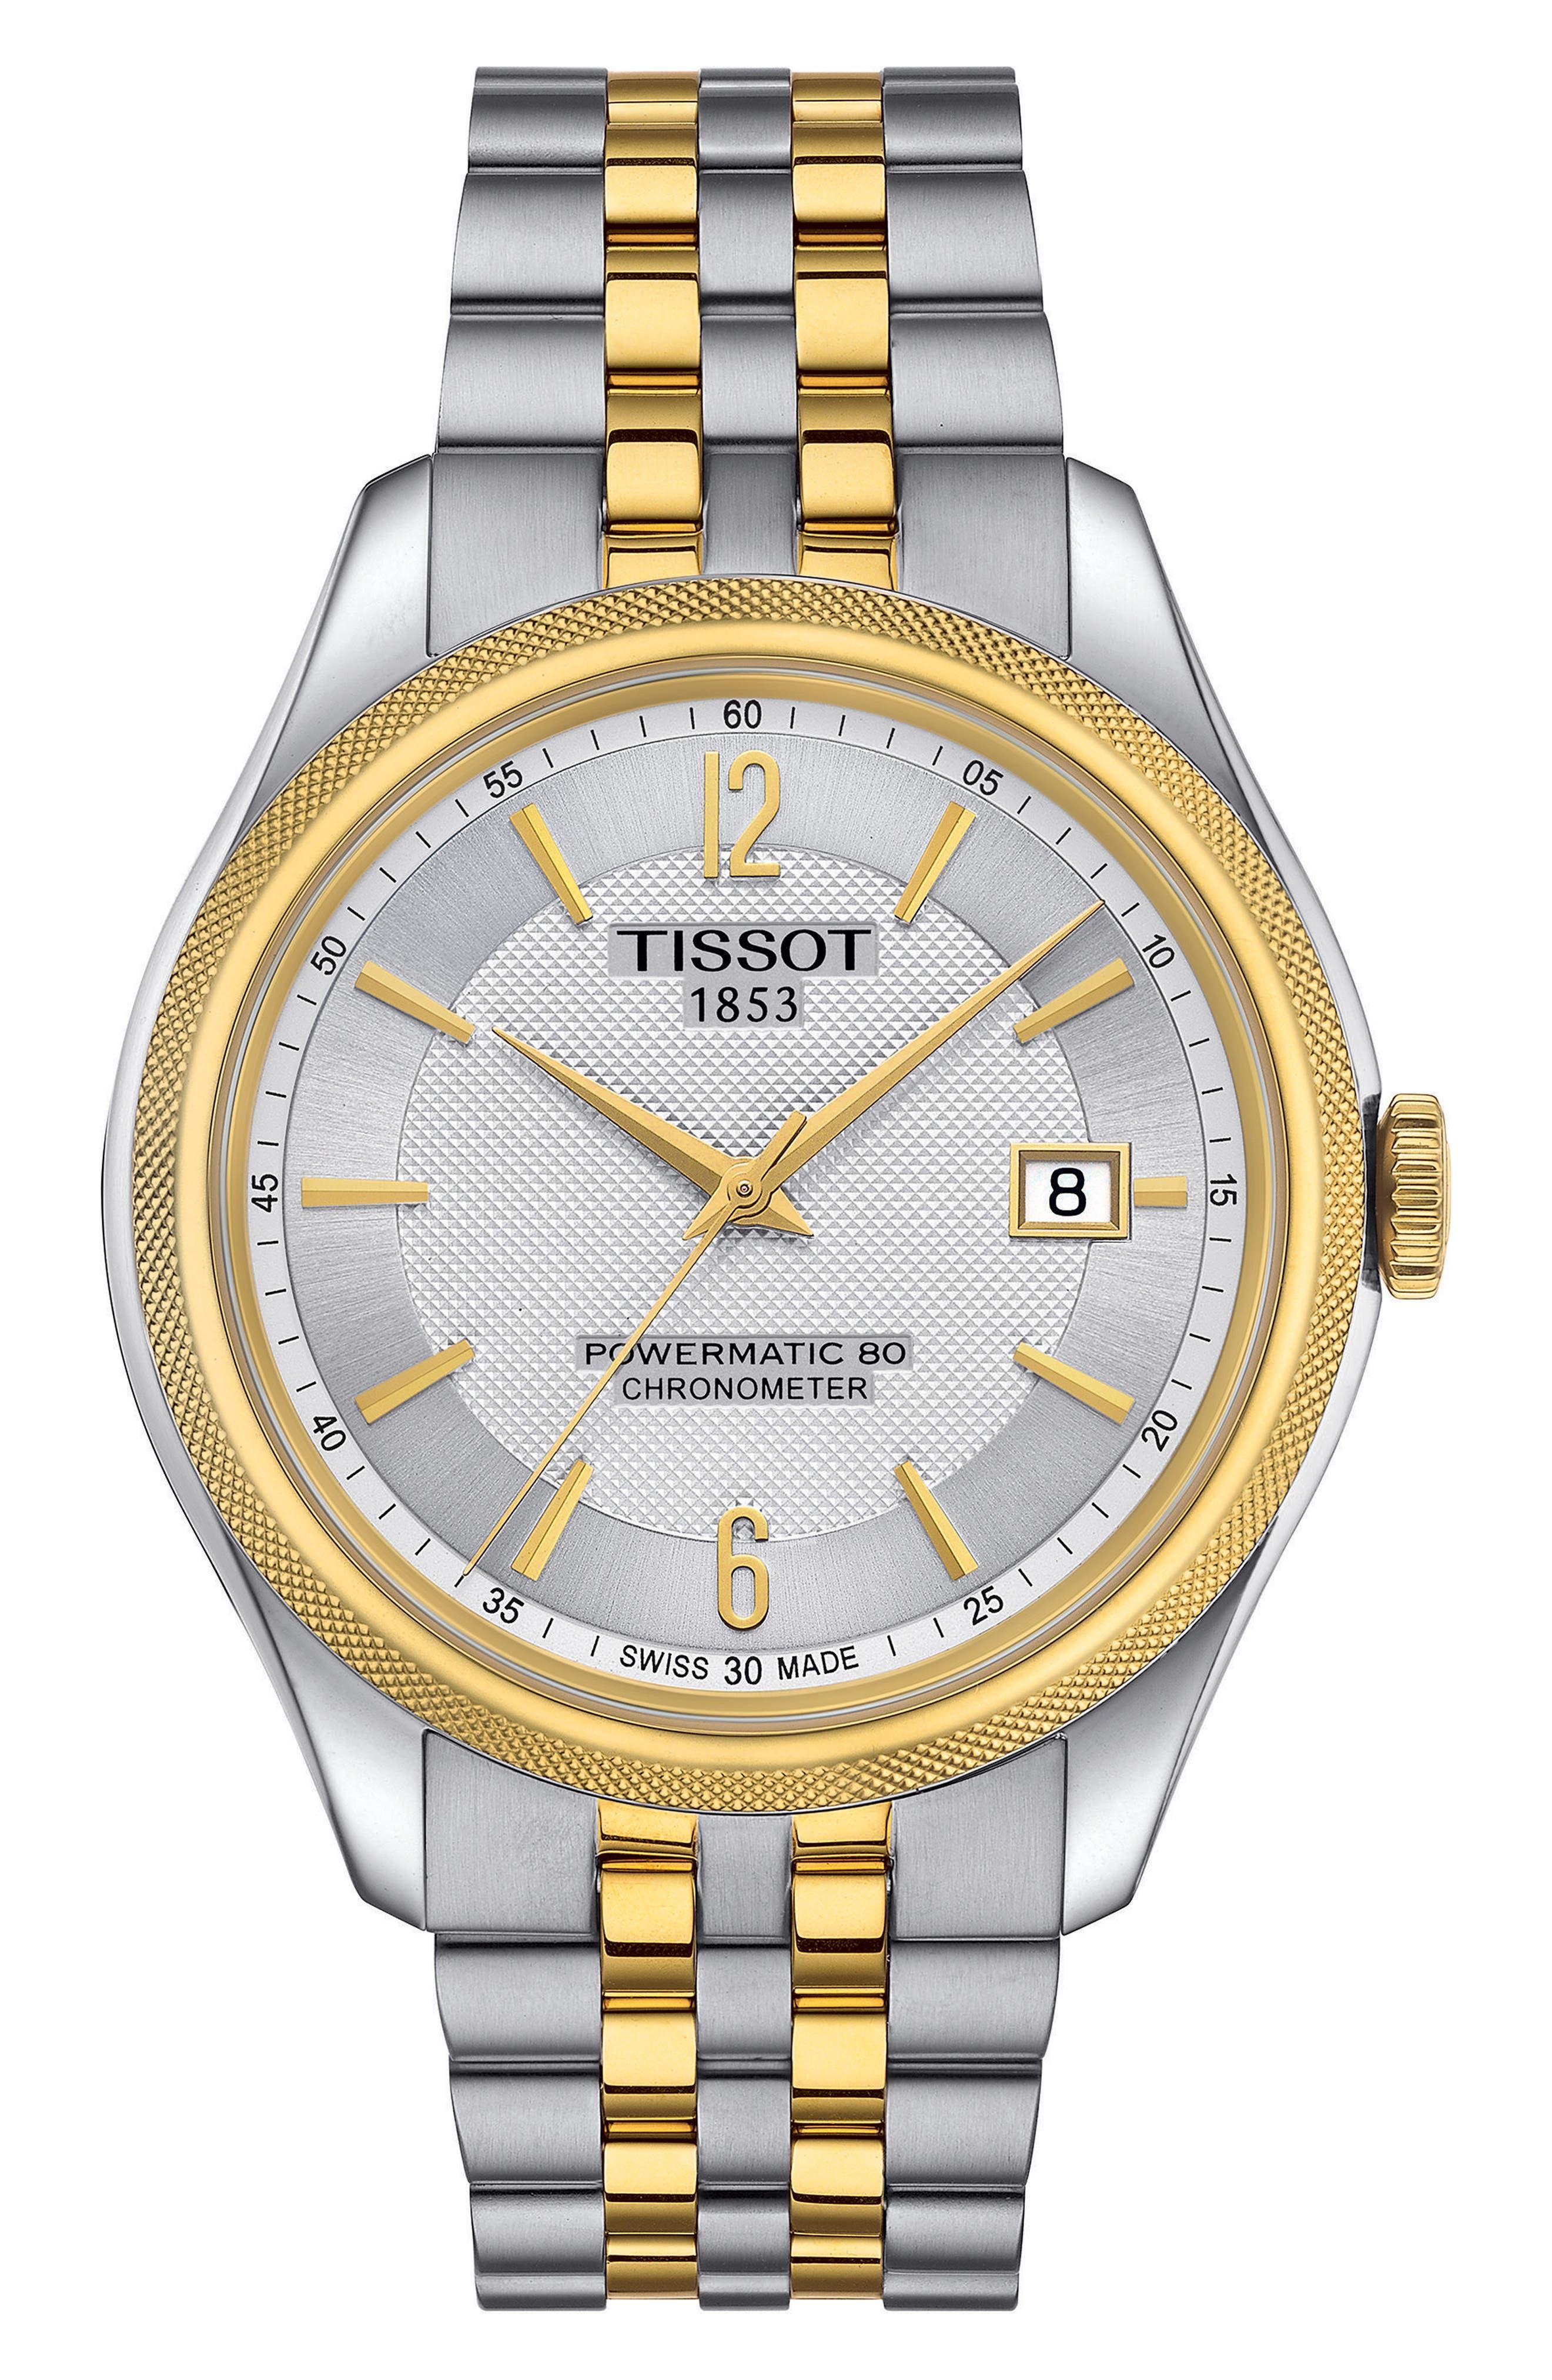 TISSOT Ballade Powermatic 80 Chronometer Bracelet Watch, 39mm x 41mm